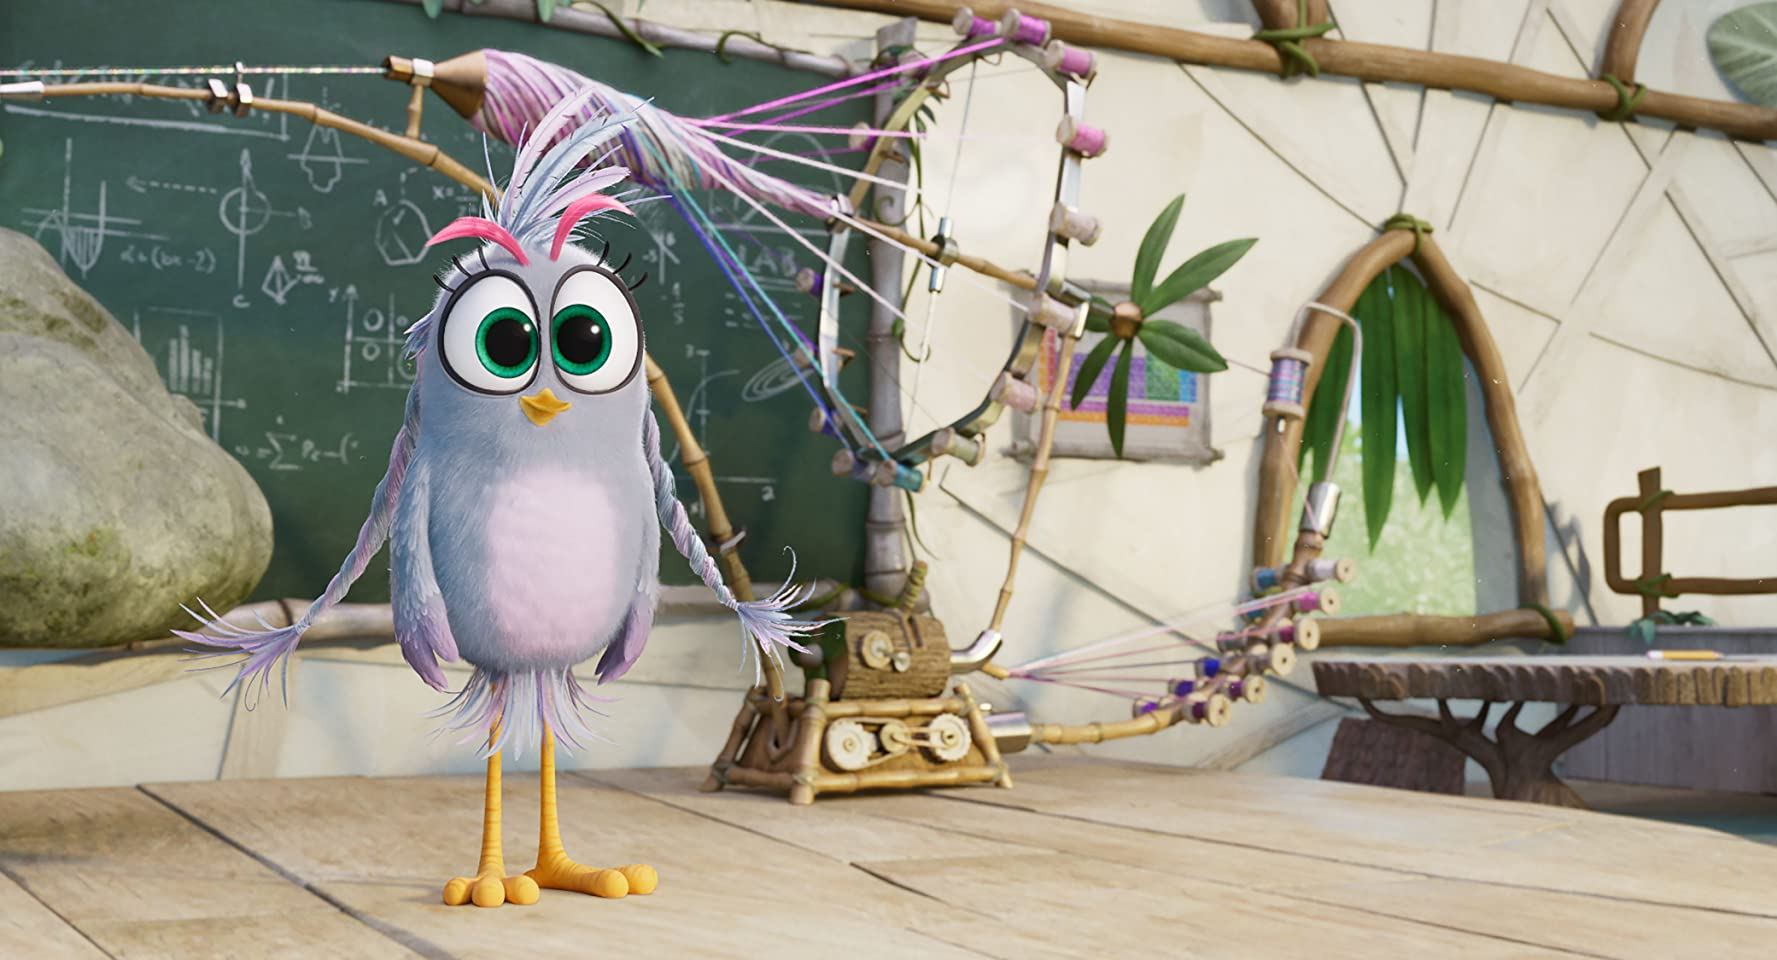 Rachel Bloom in The Angry Birds Movie 2 (2019)